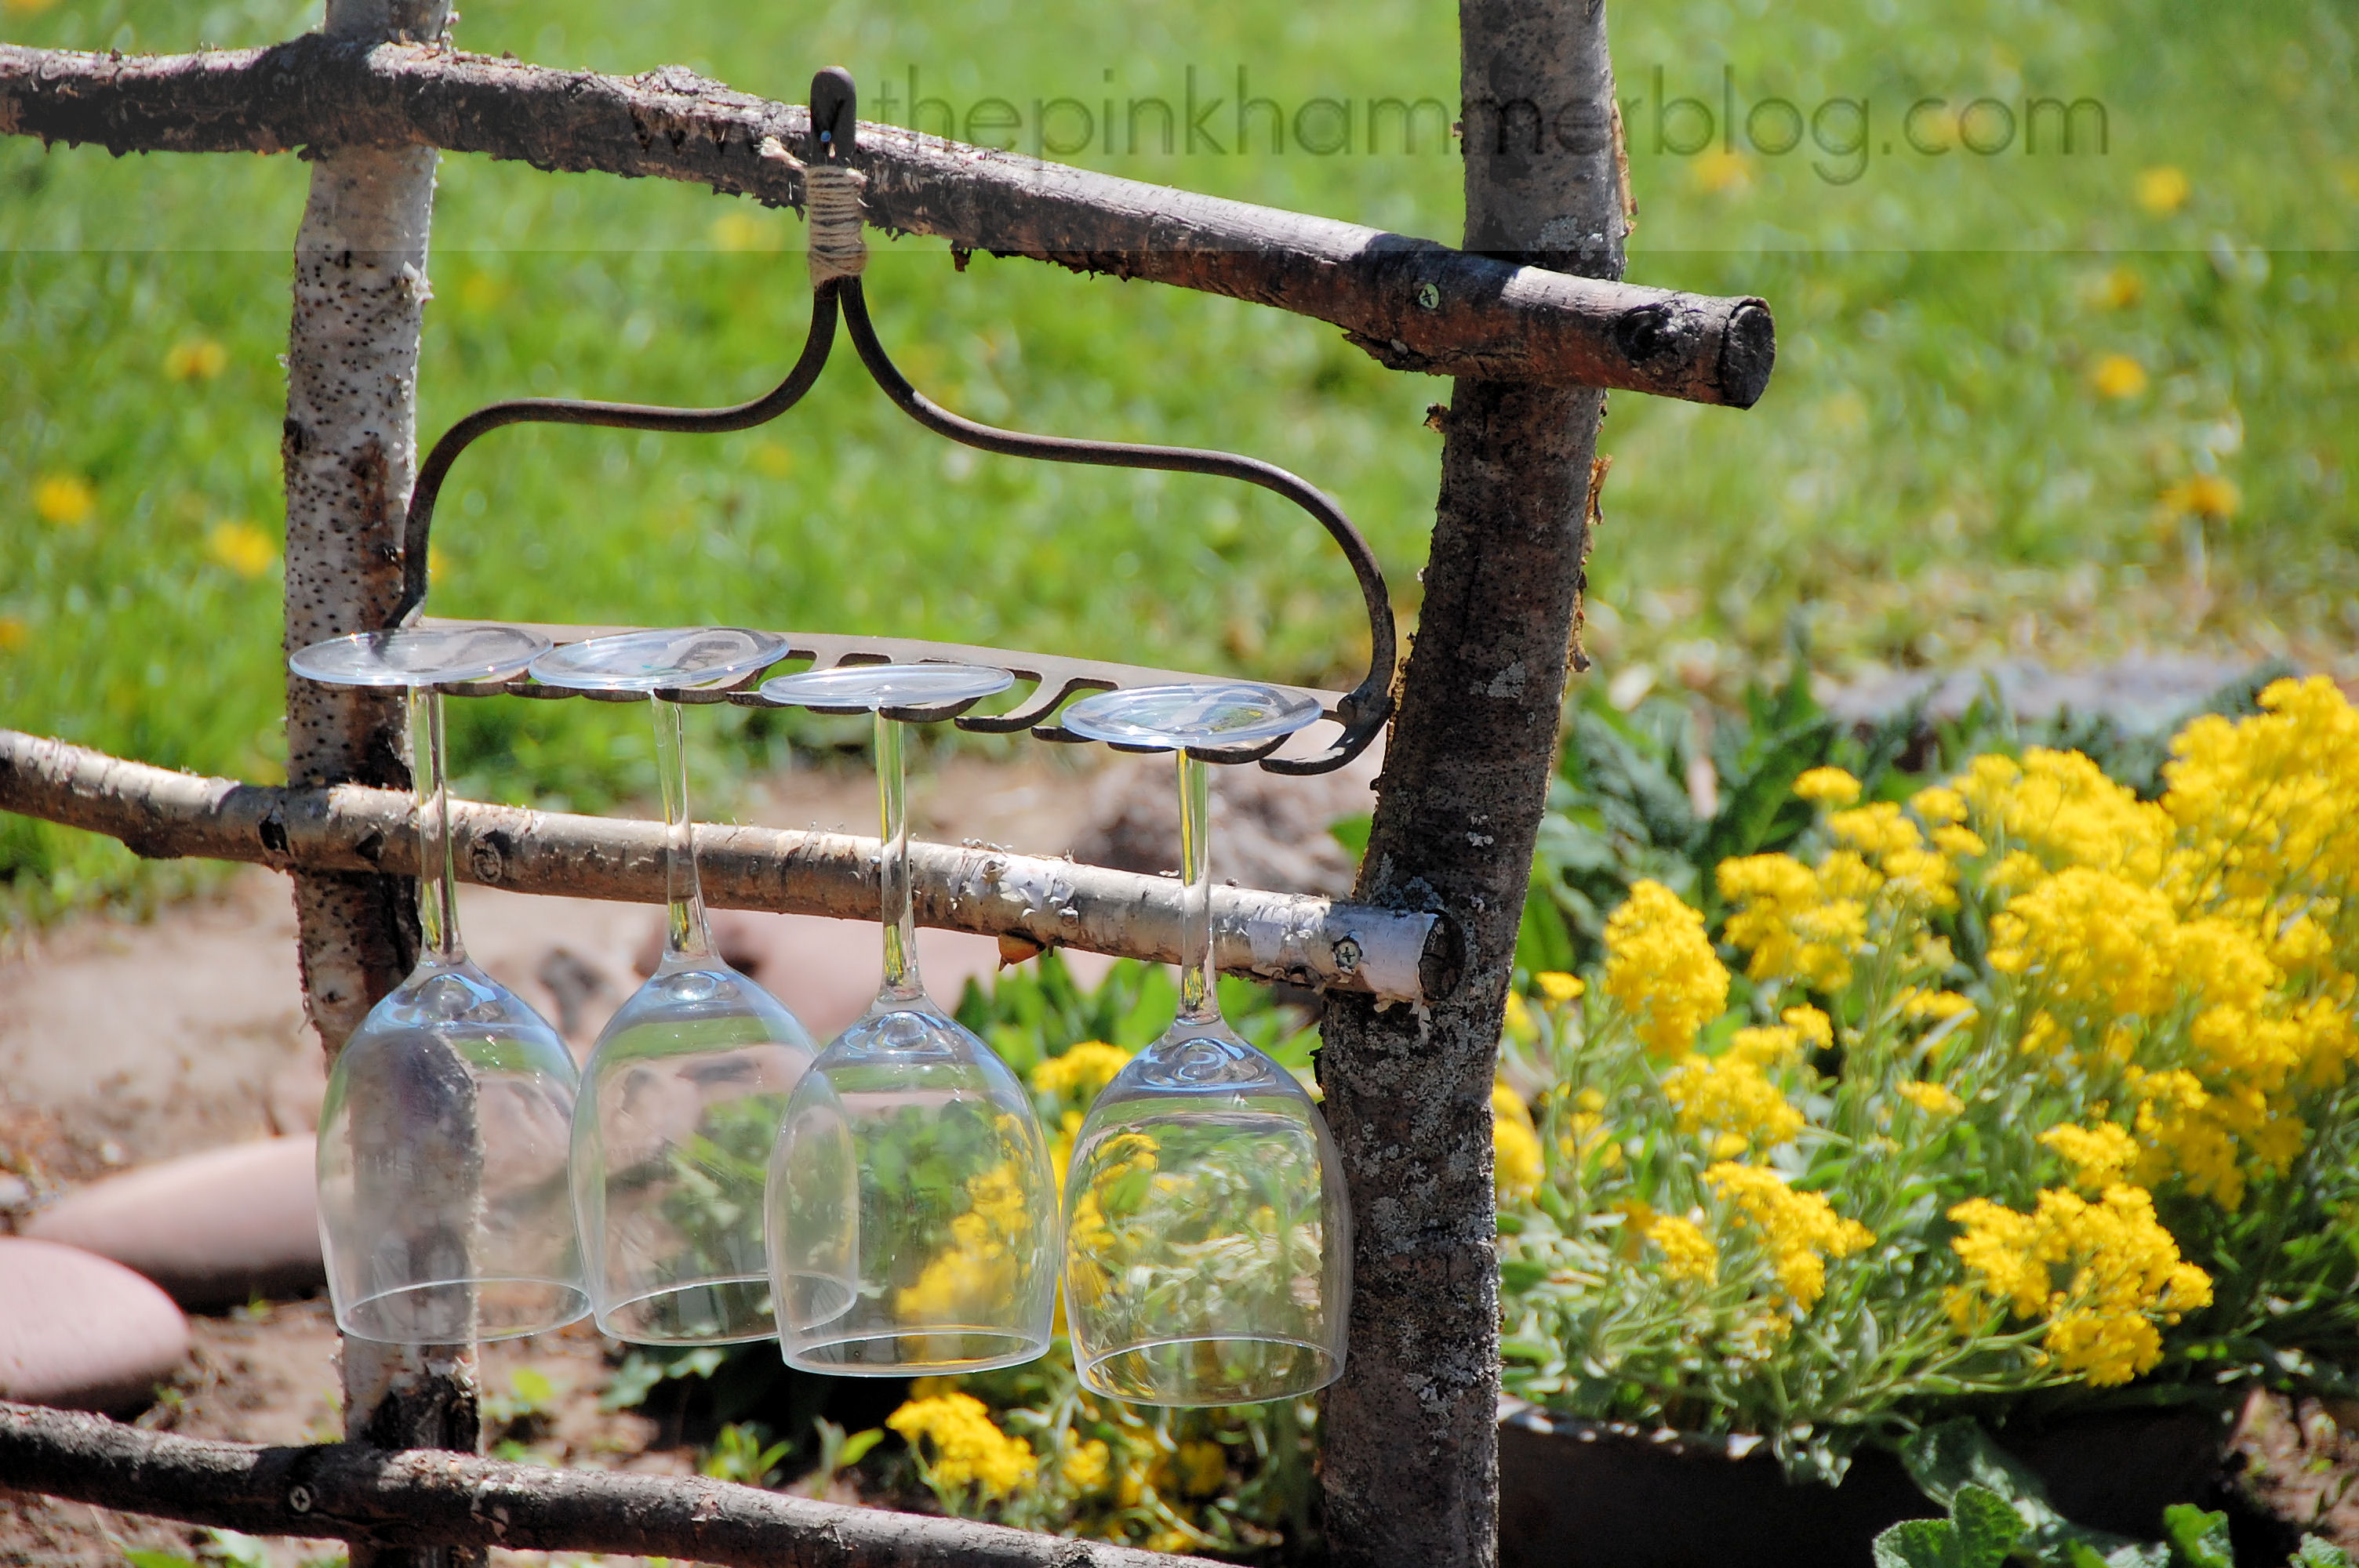 Metal Wine Glass Holder: From Broken Rake To Rustic Wine Glass Holder